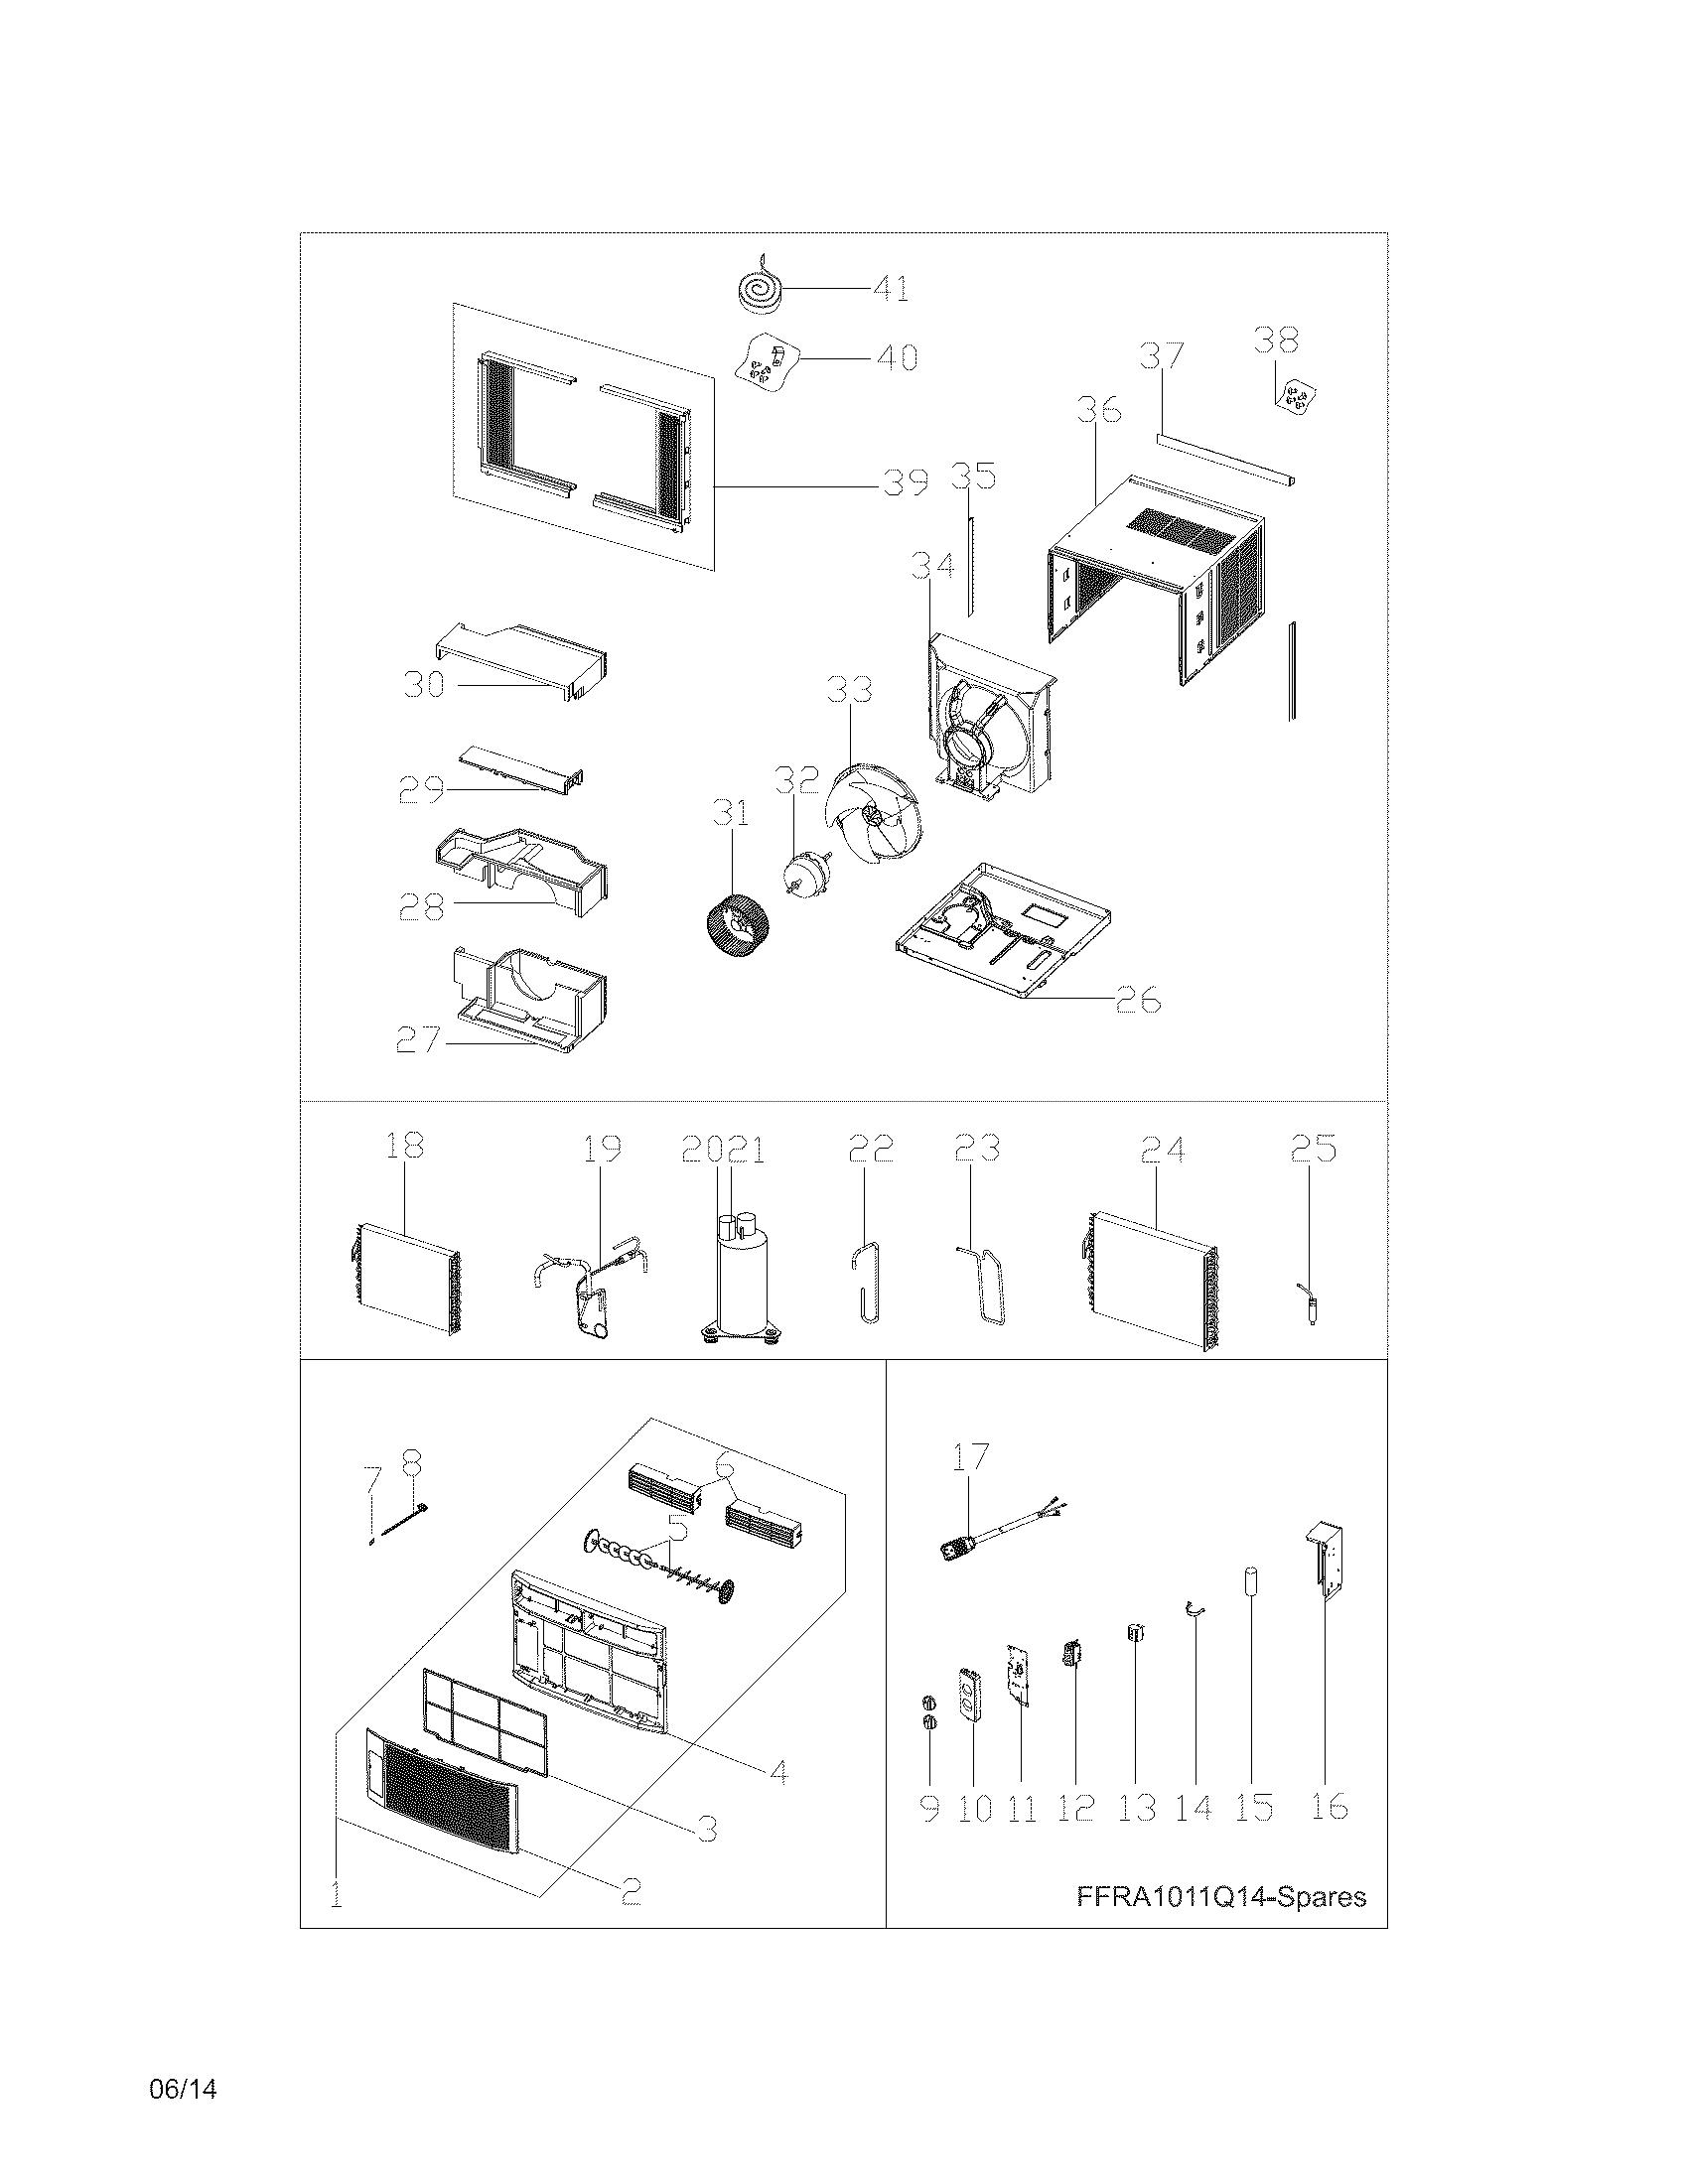 Frigidaire Ffra Q15 Screw Kit 4 Pc